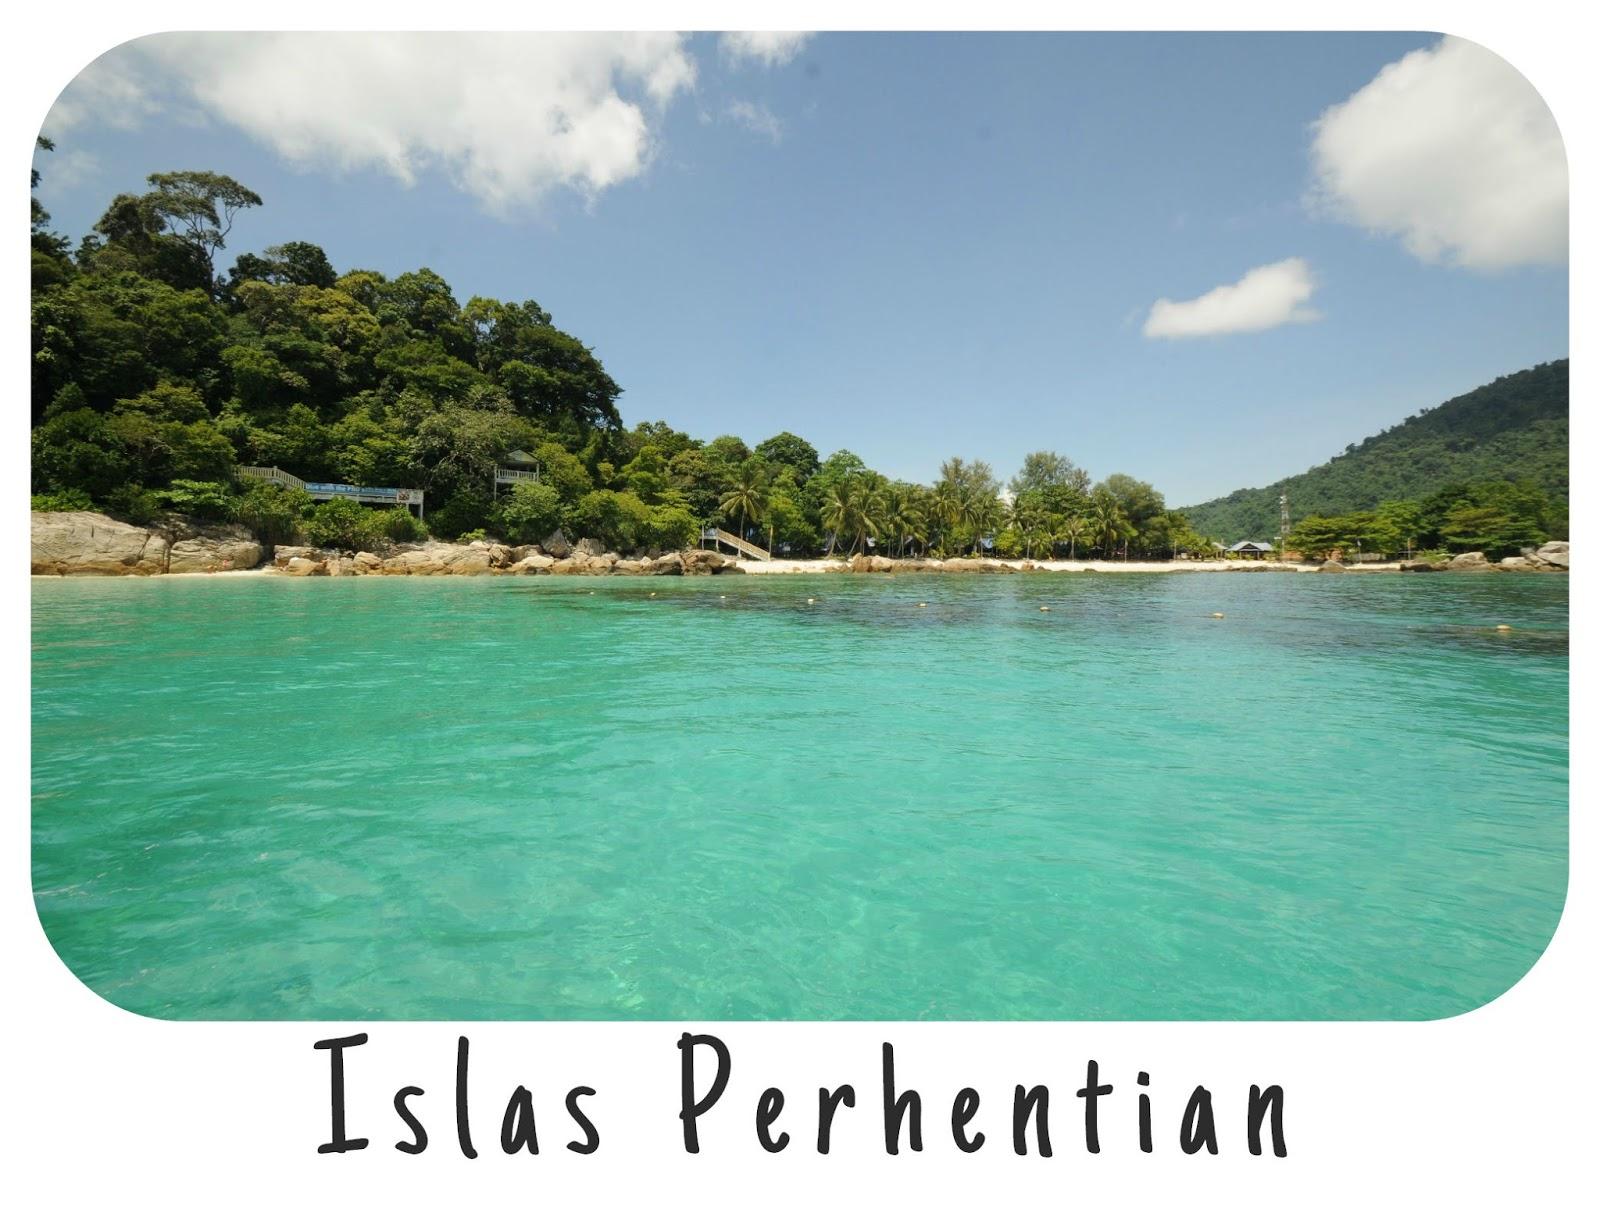 http://www.depatitasenelmundo.es/2014/04/islas-perhentian.html